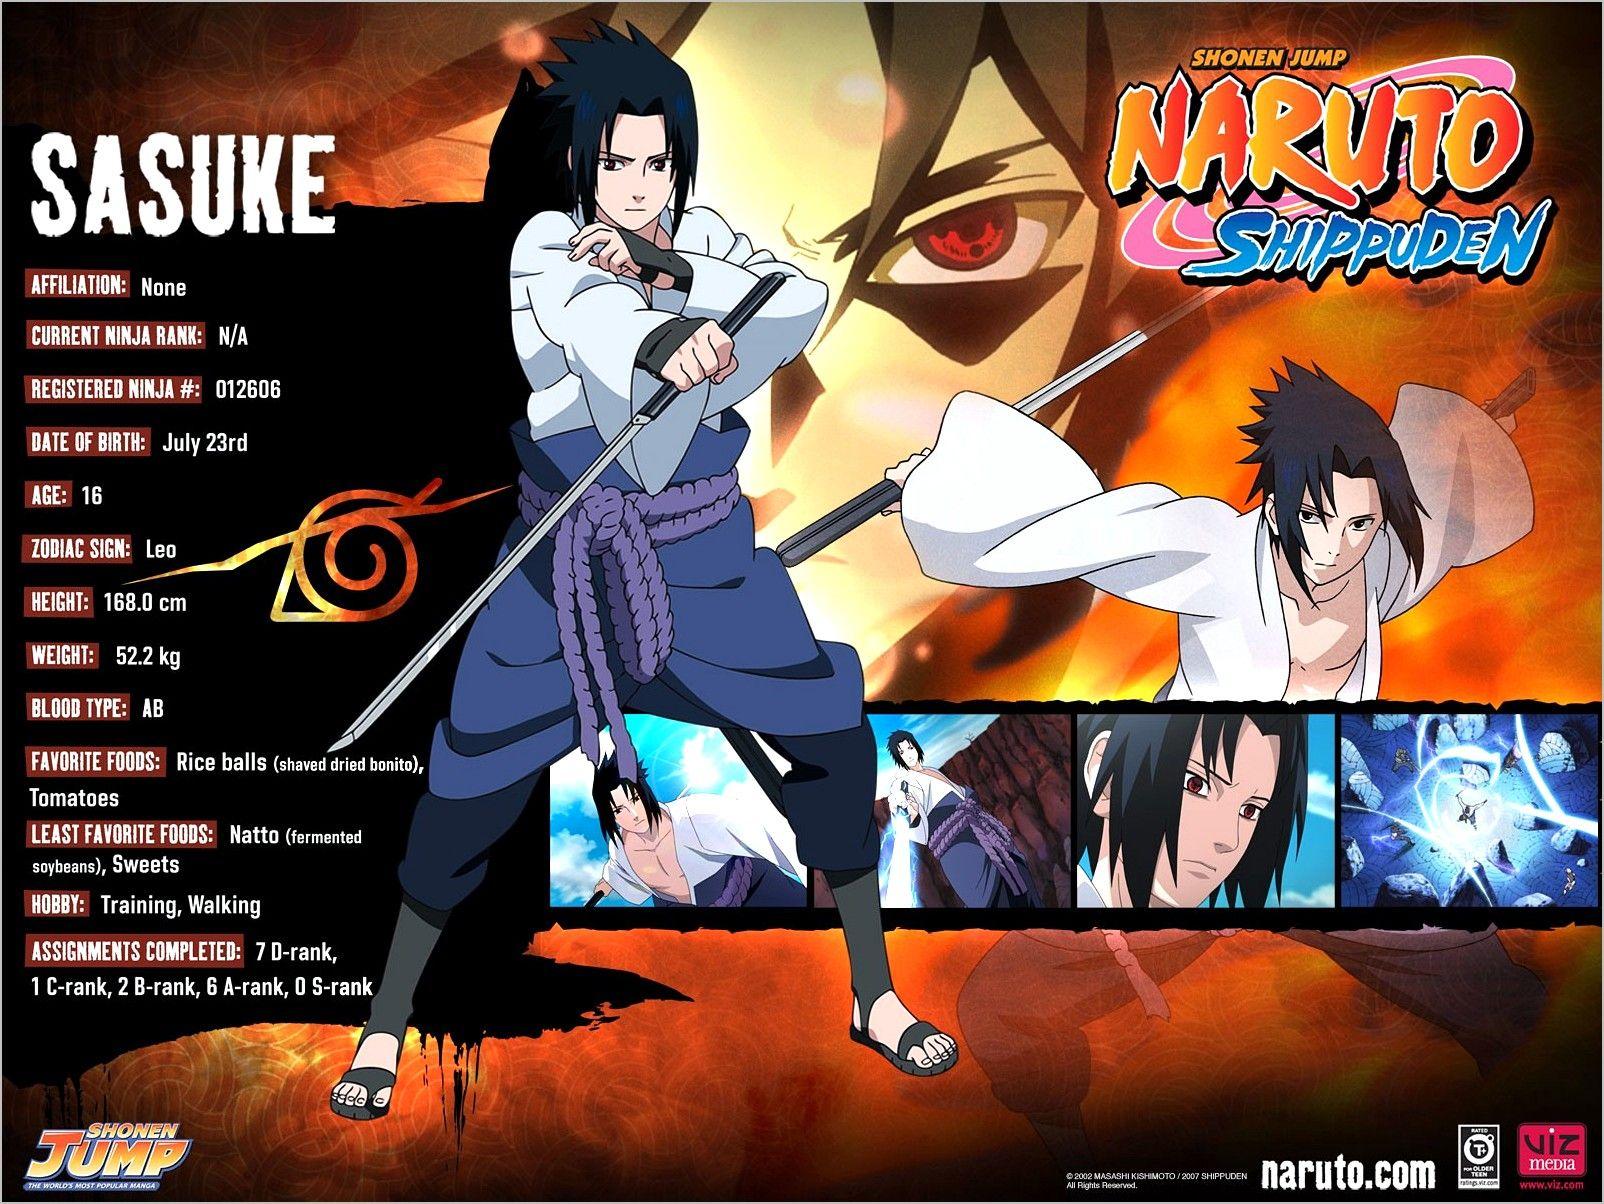 Windows 10 Wallpaper 4k Anime In 2020 Naruto Shippuden Characters Naruto Naruto The Movie